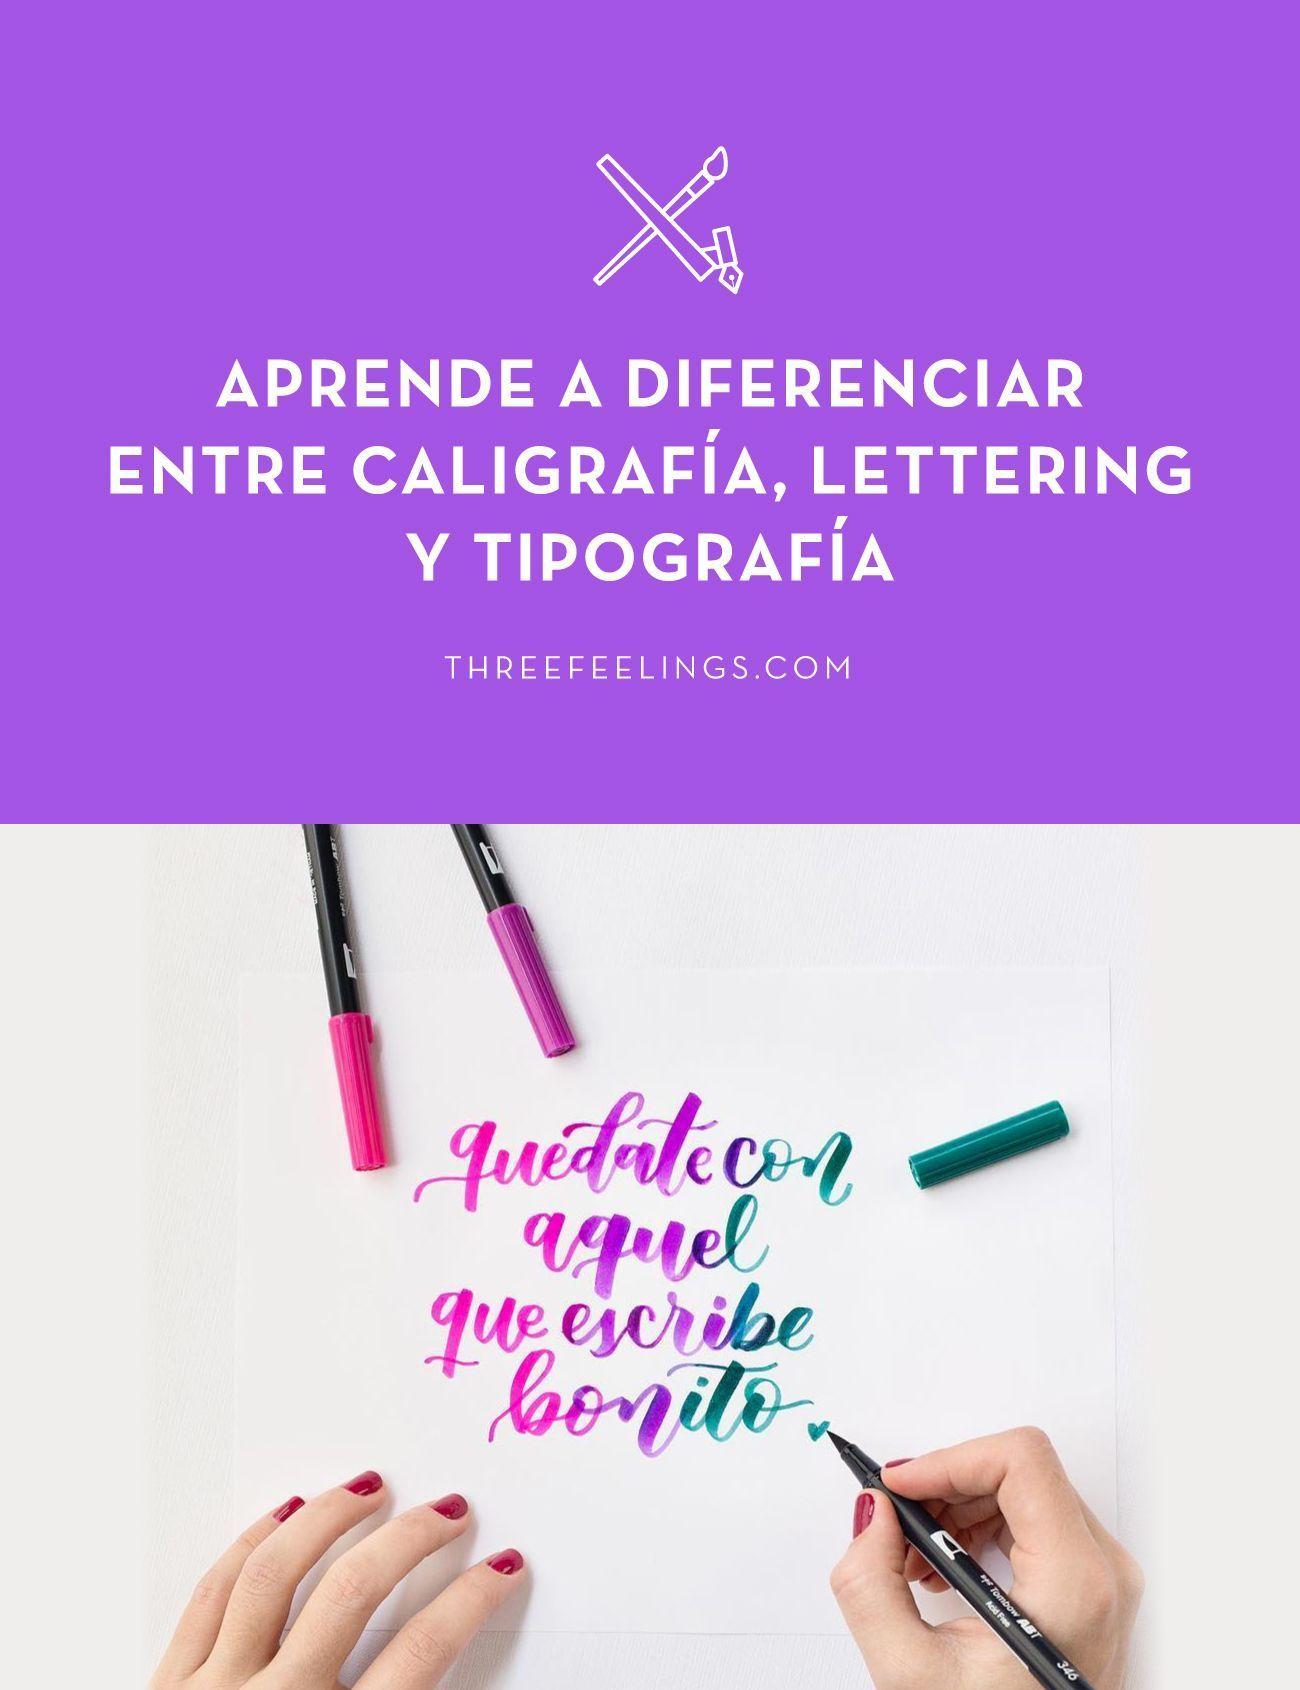 diferencia-caligrafia-lettering-tipografia-threefeelings-00